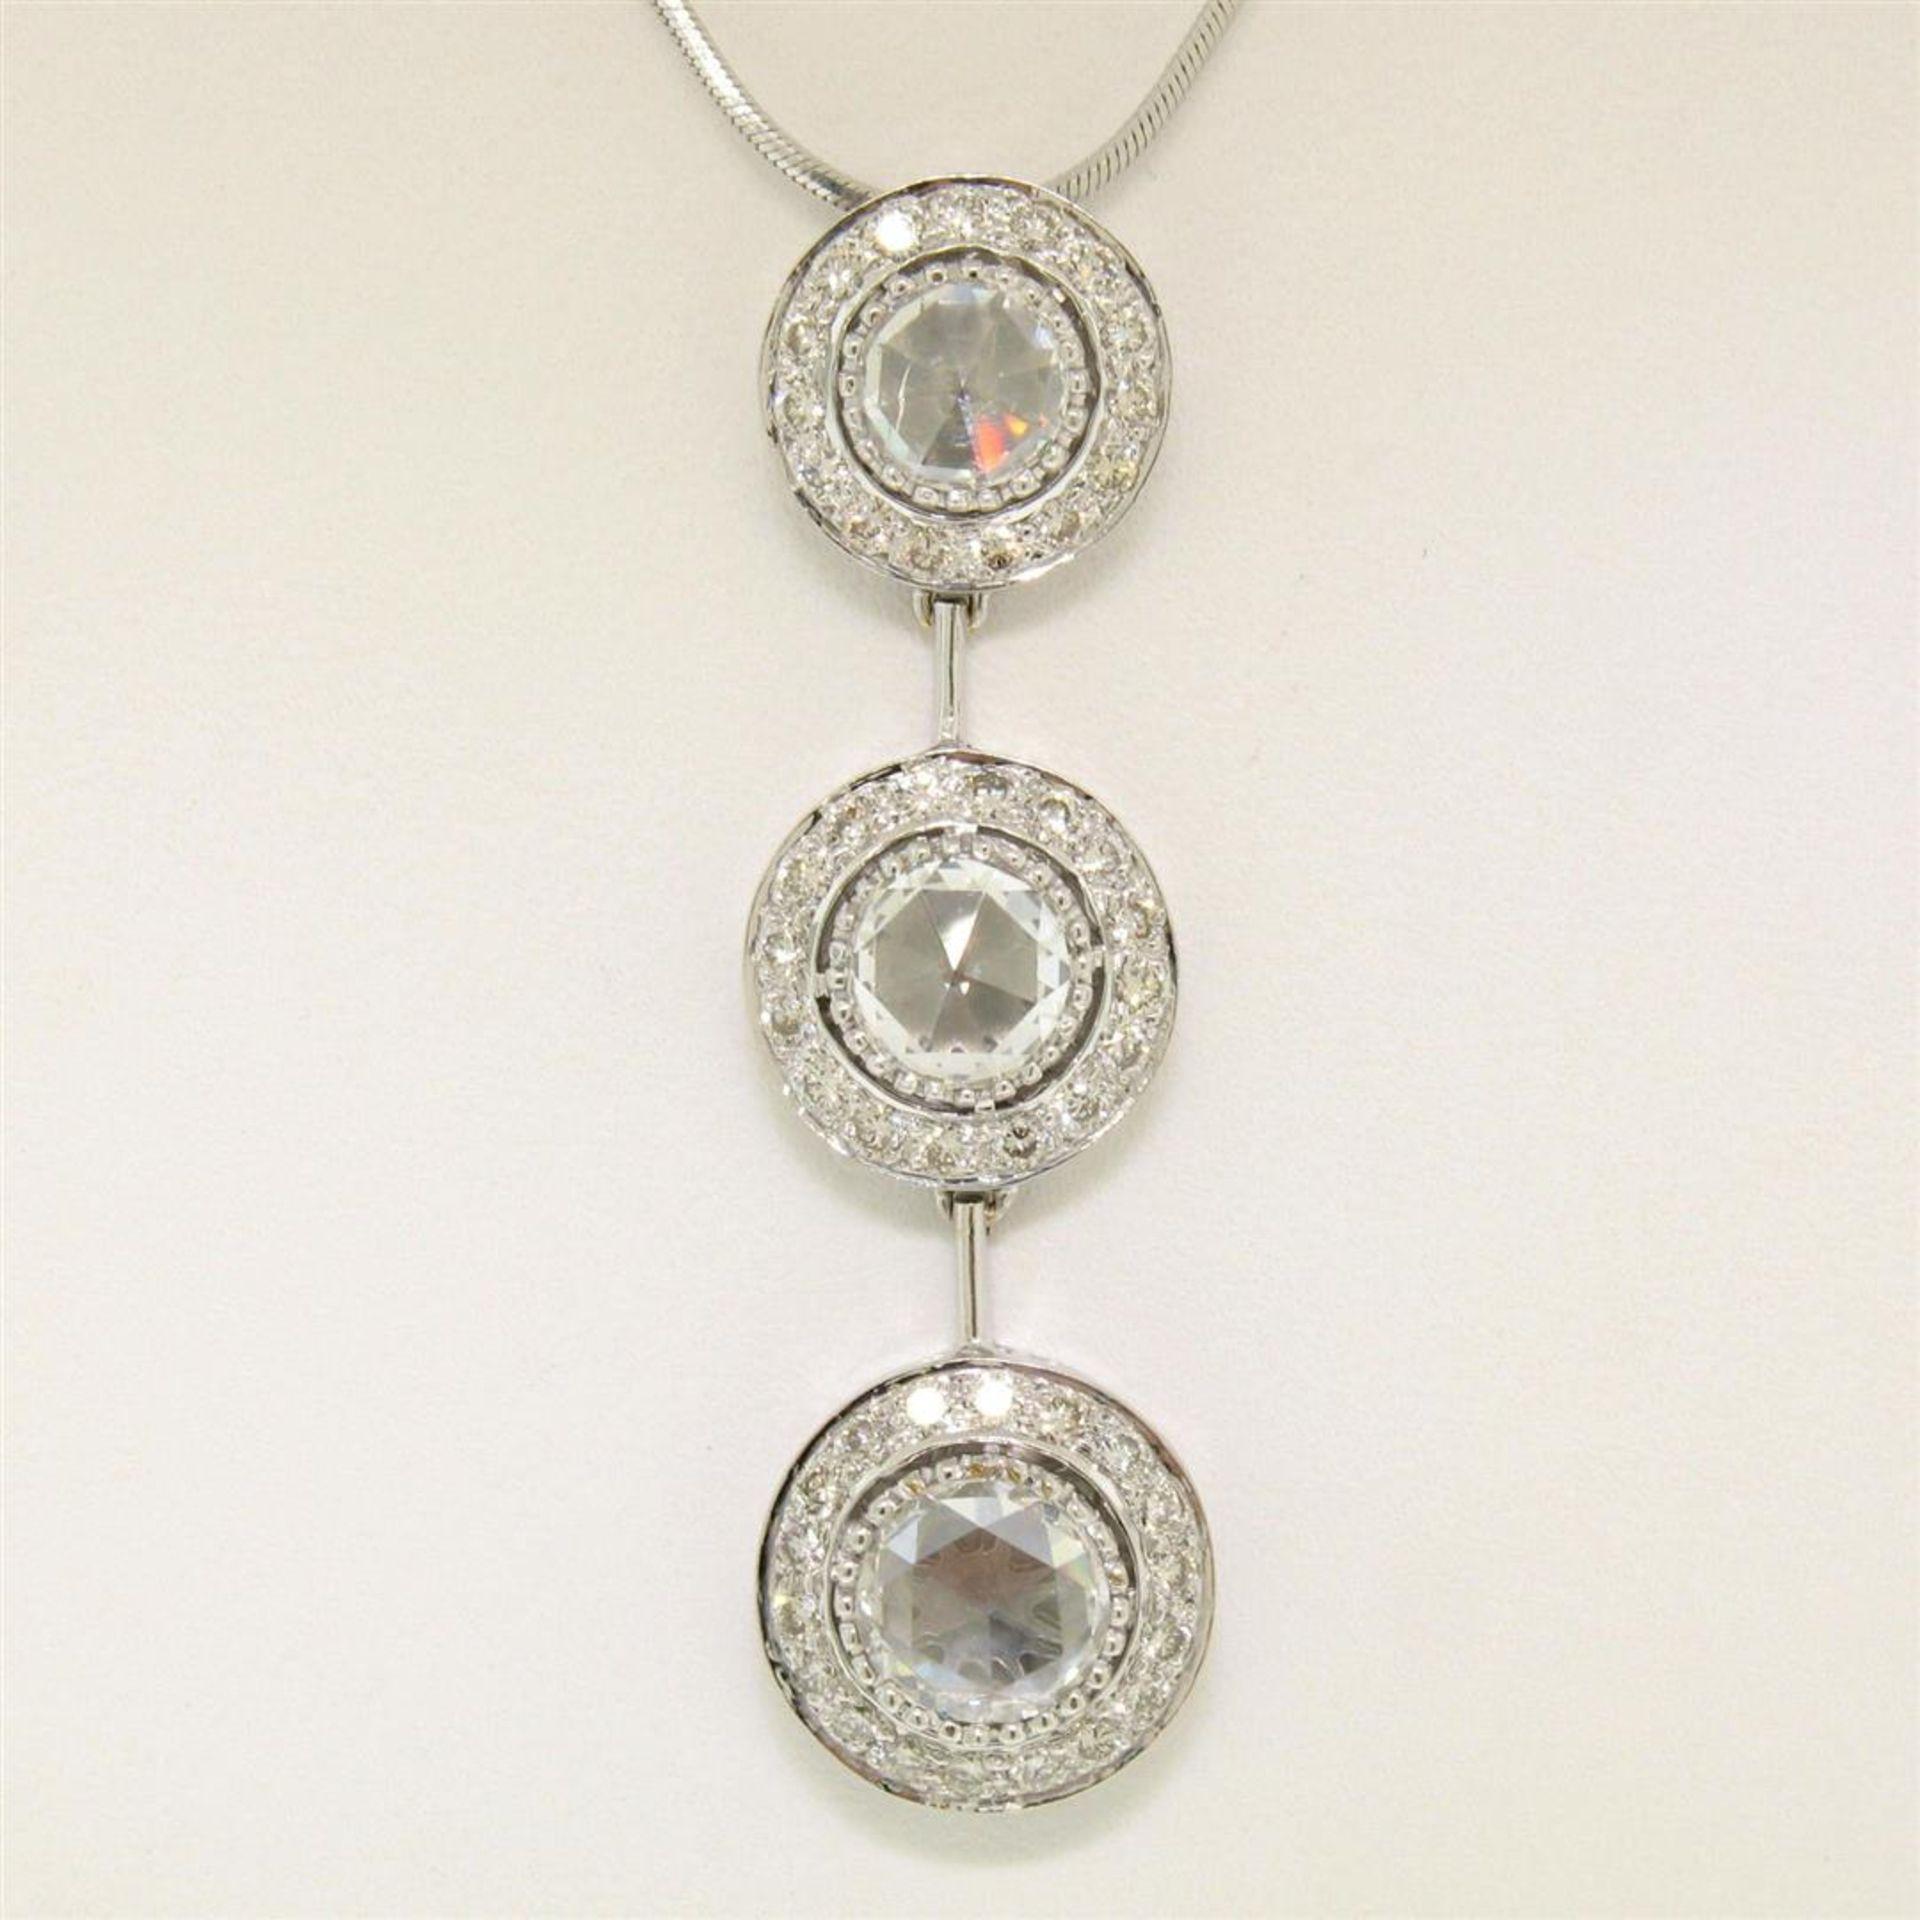 Vintage 18K White Gold 2.59 ctw 3 Rose Cut Diamond Drop Pendant w/ Triple Halo - Image 3 of 9